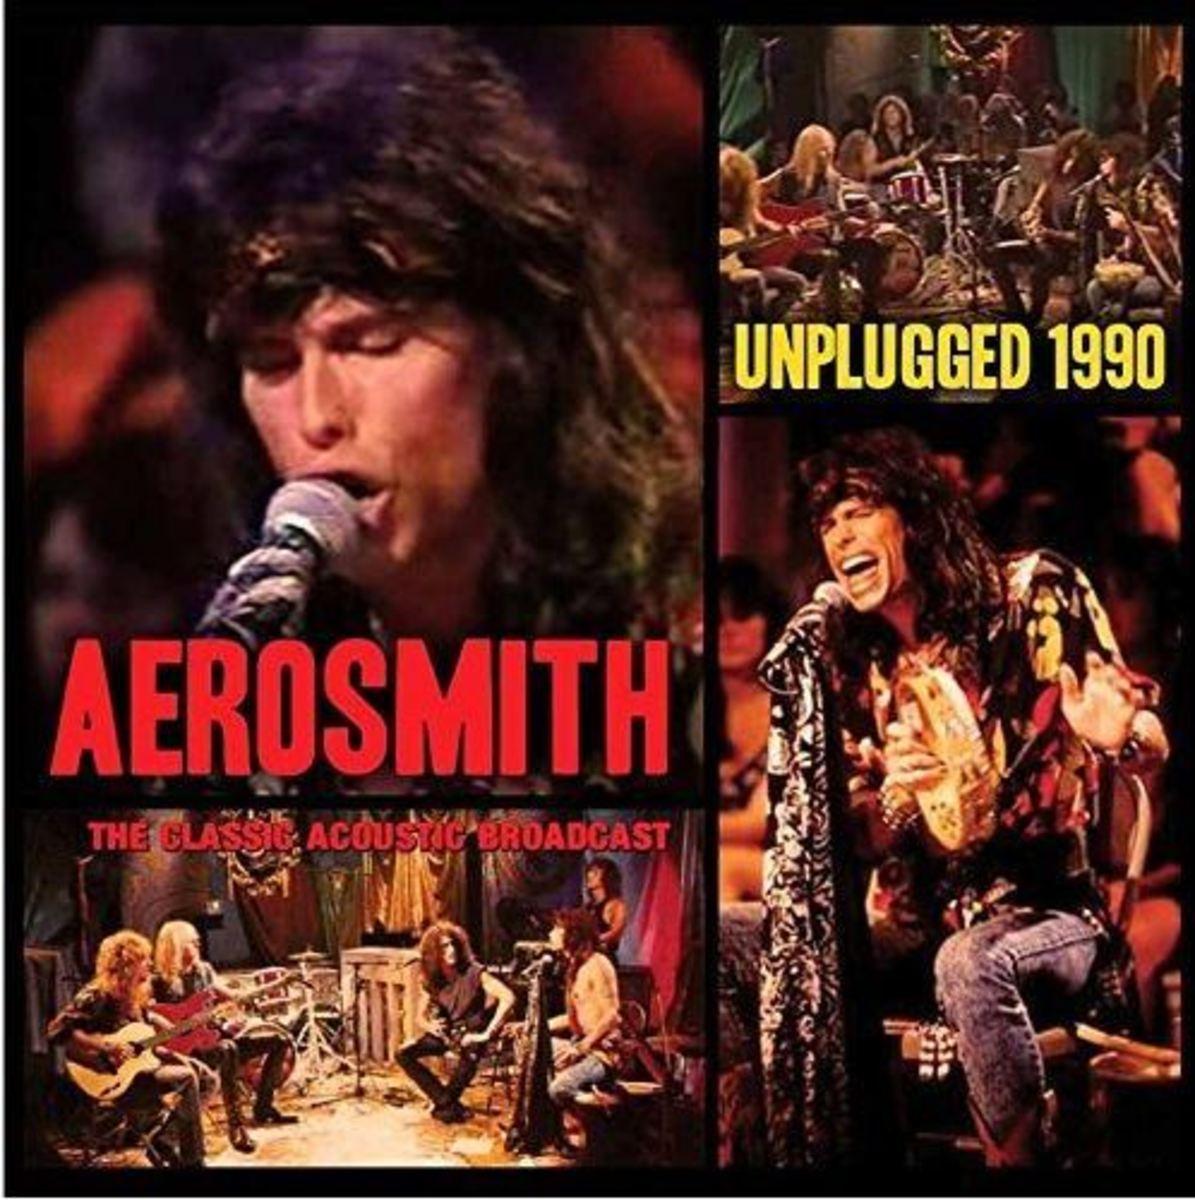 aerosmith-unplugged-1990-review